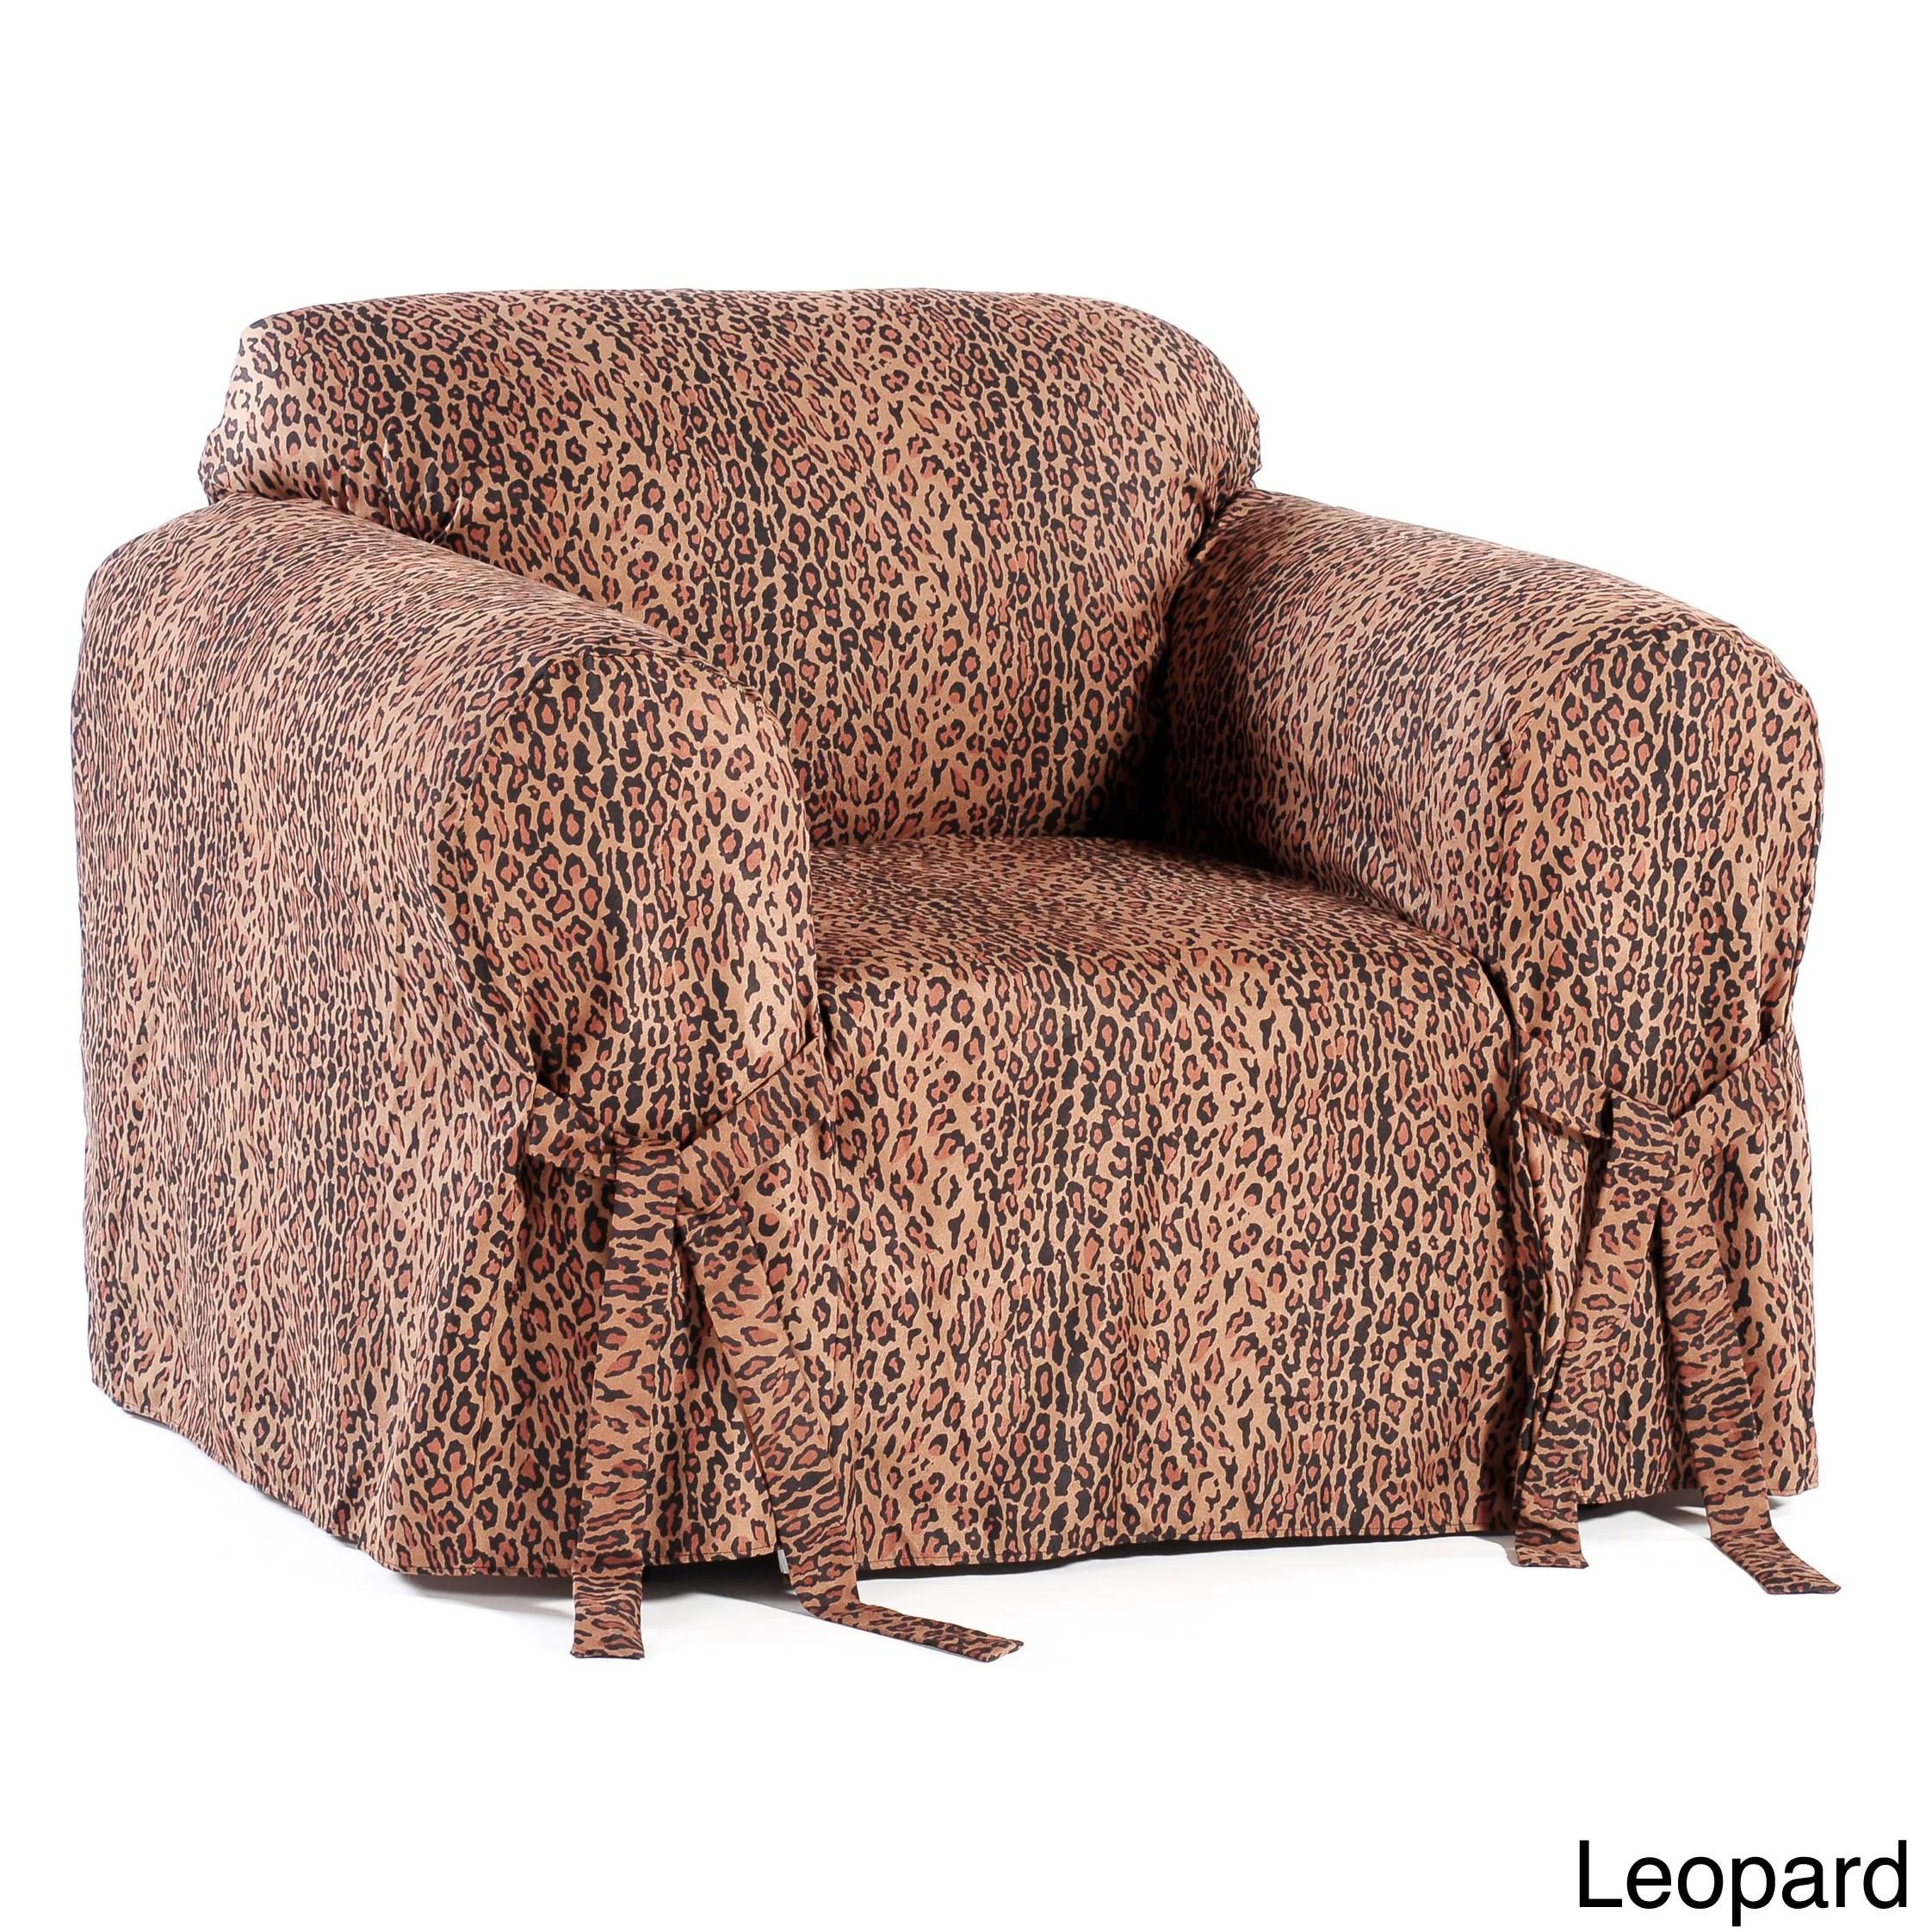 chair covers overstock lifetime adirondack sam s club microsuede animal print slipcover